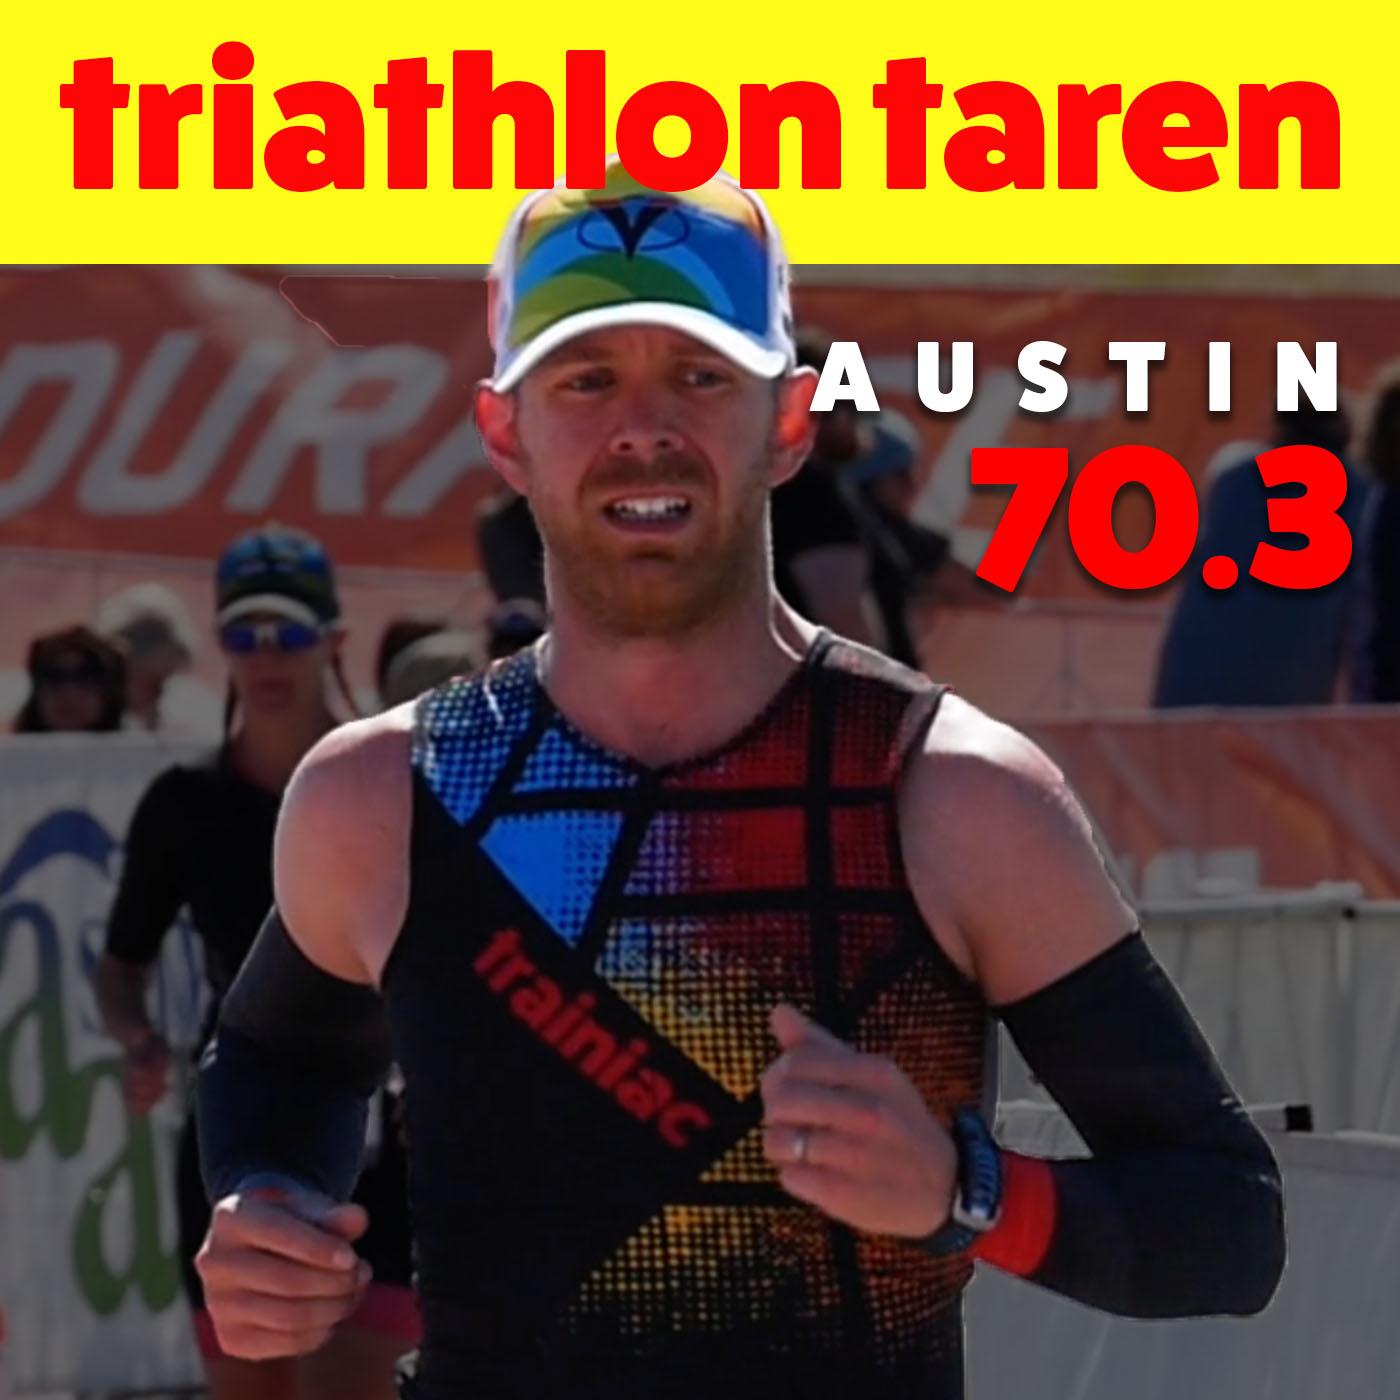 Half-Ironman Austin 70.3 2017 Race Recap